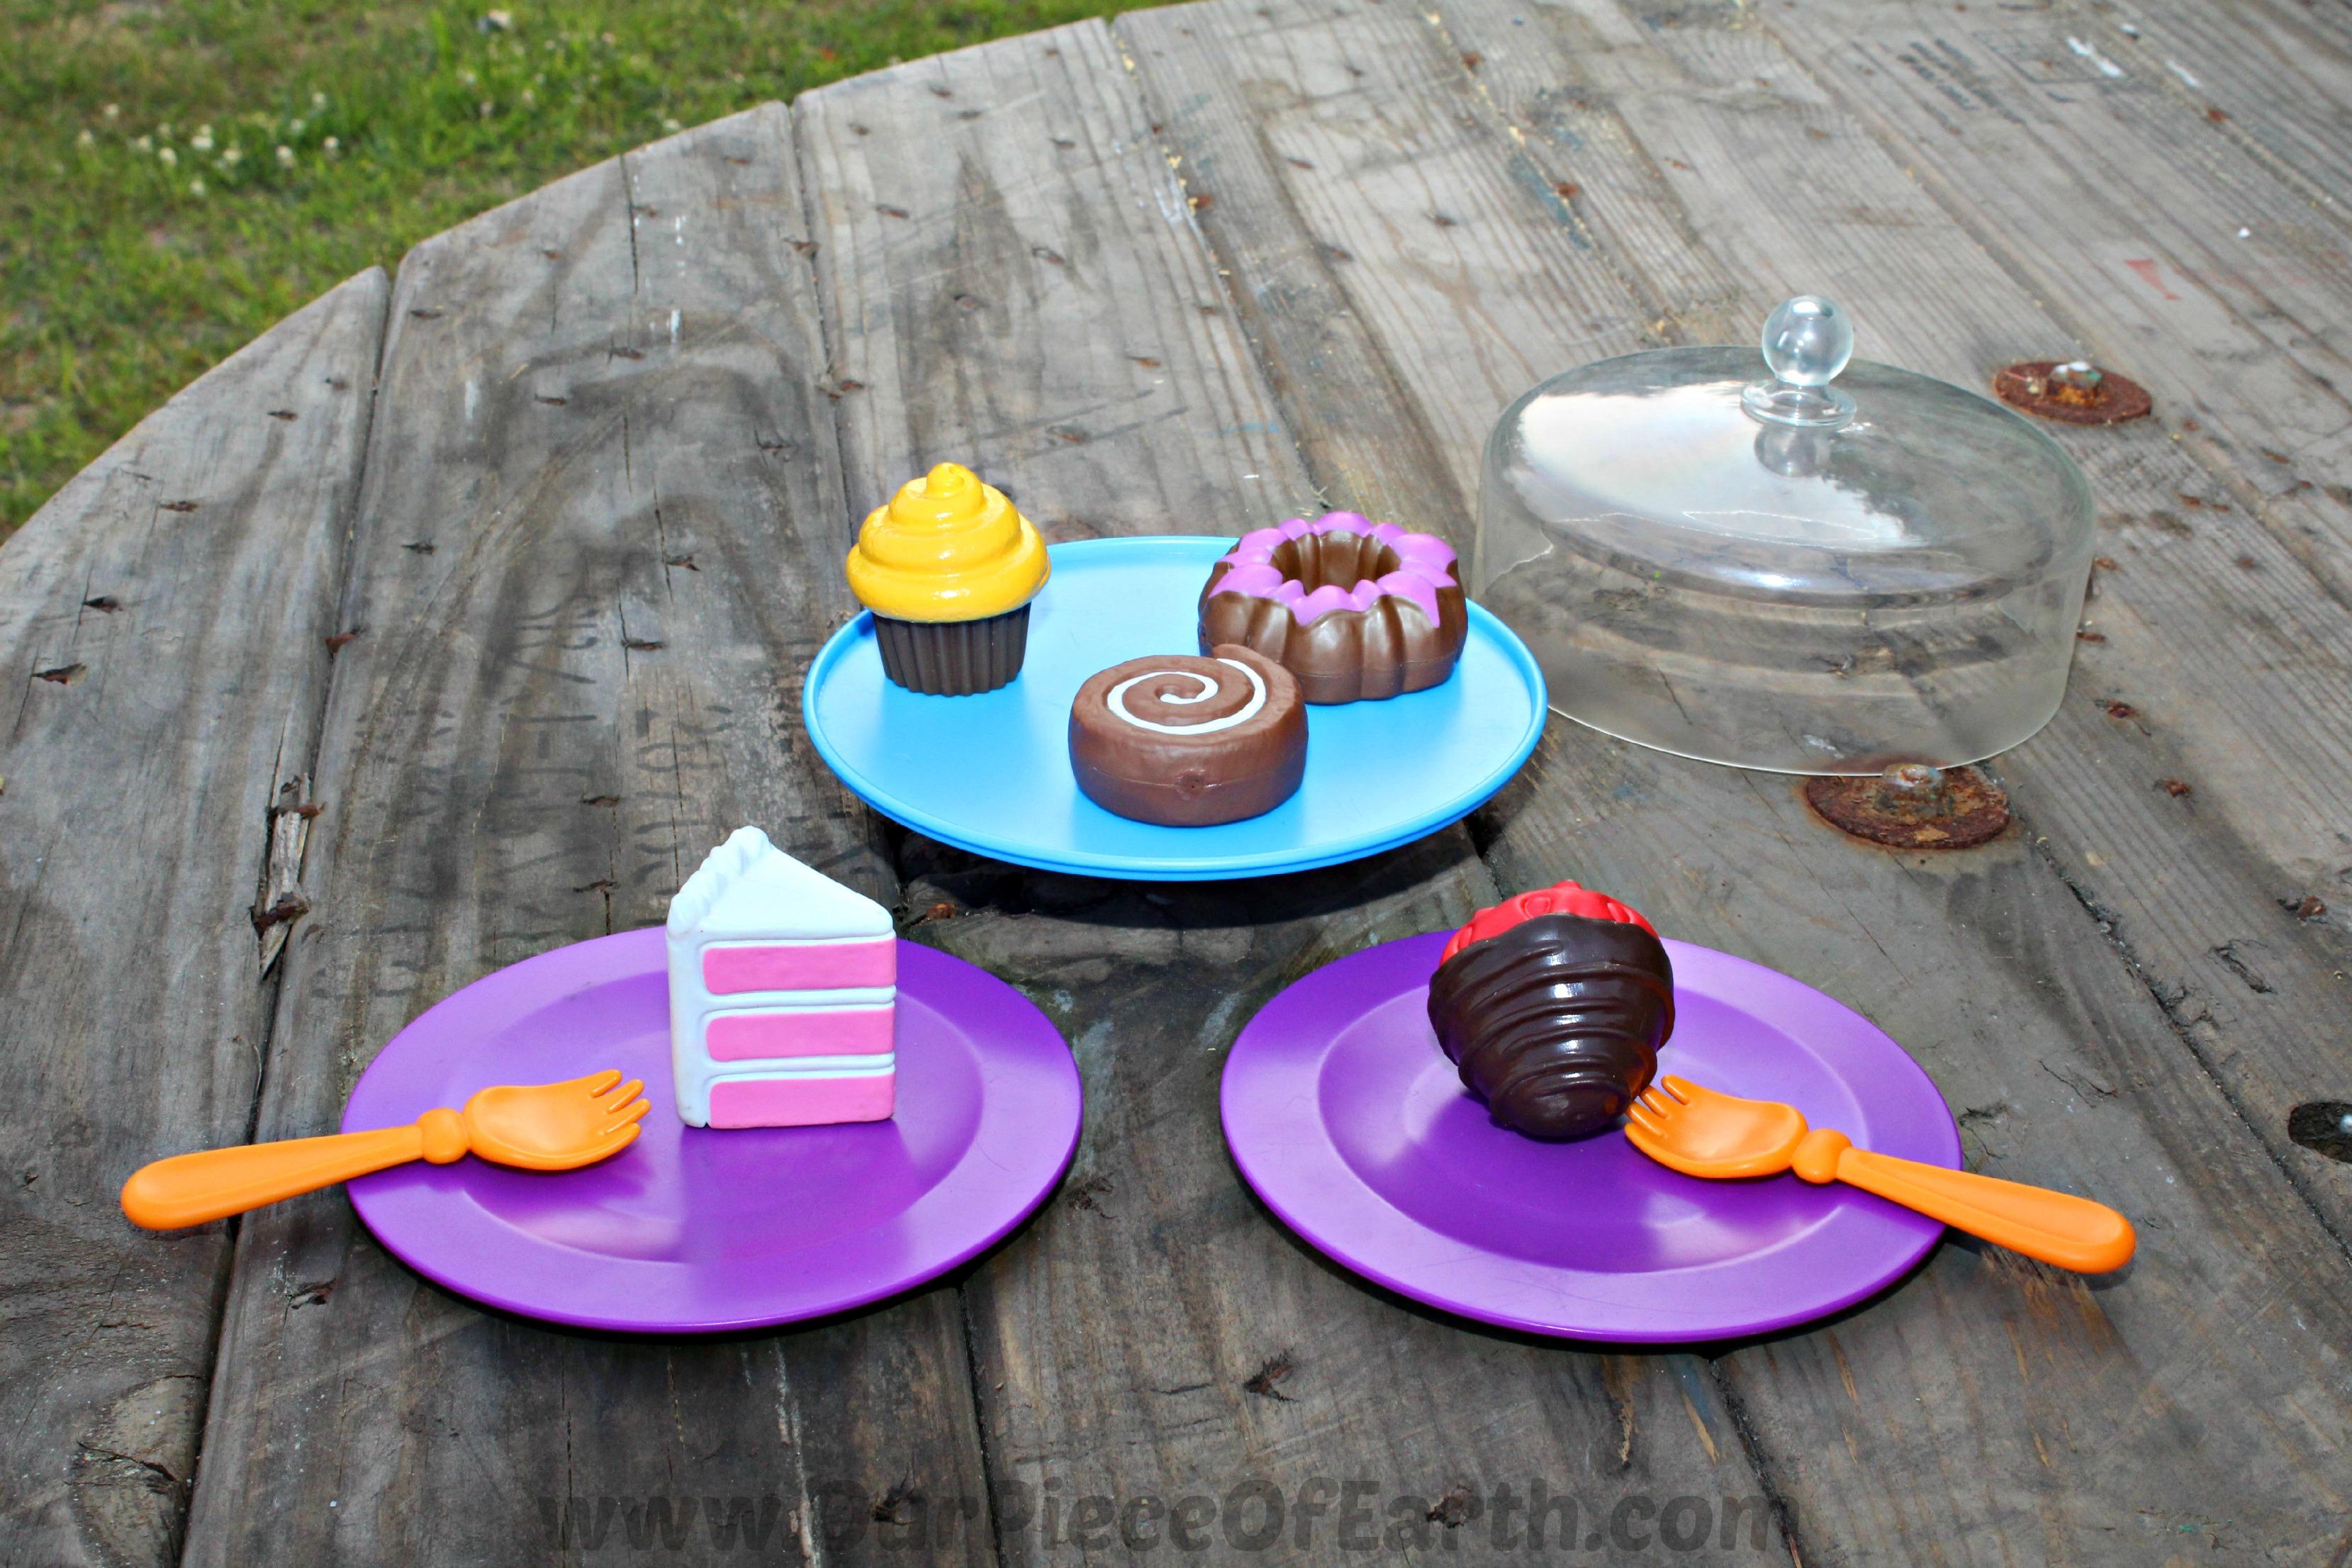 Just Desserts served